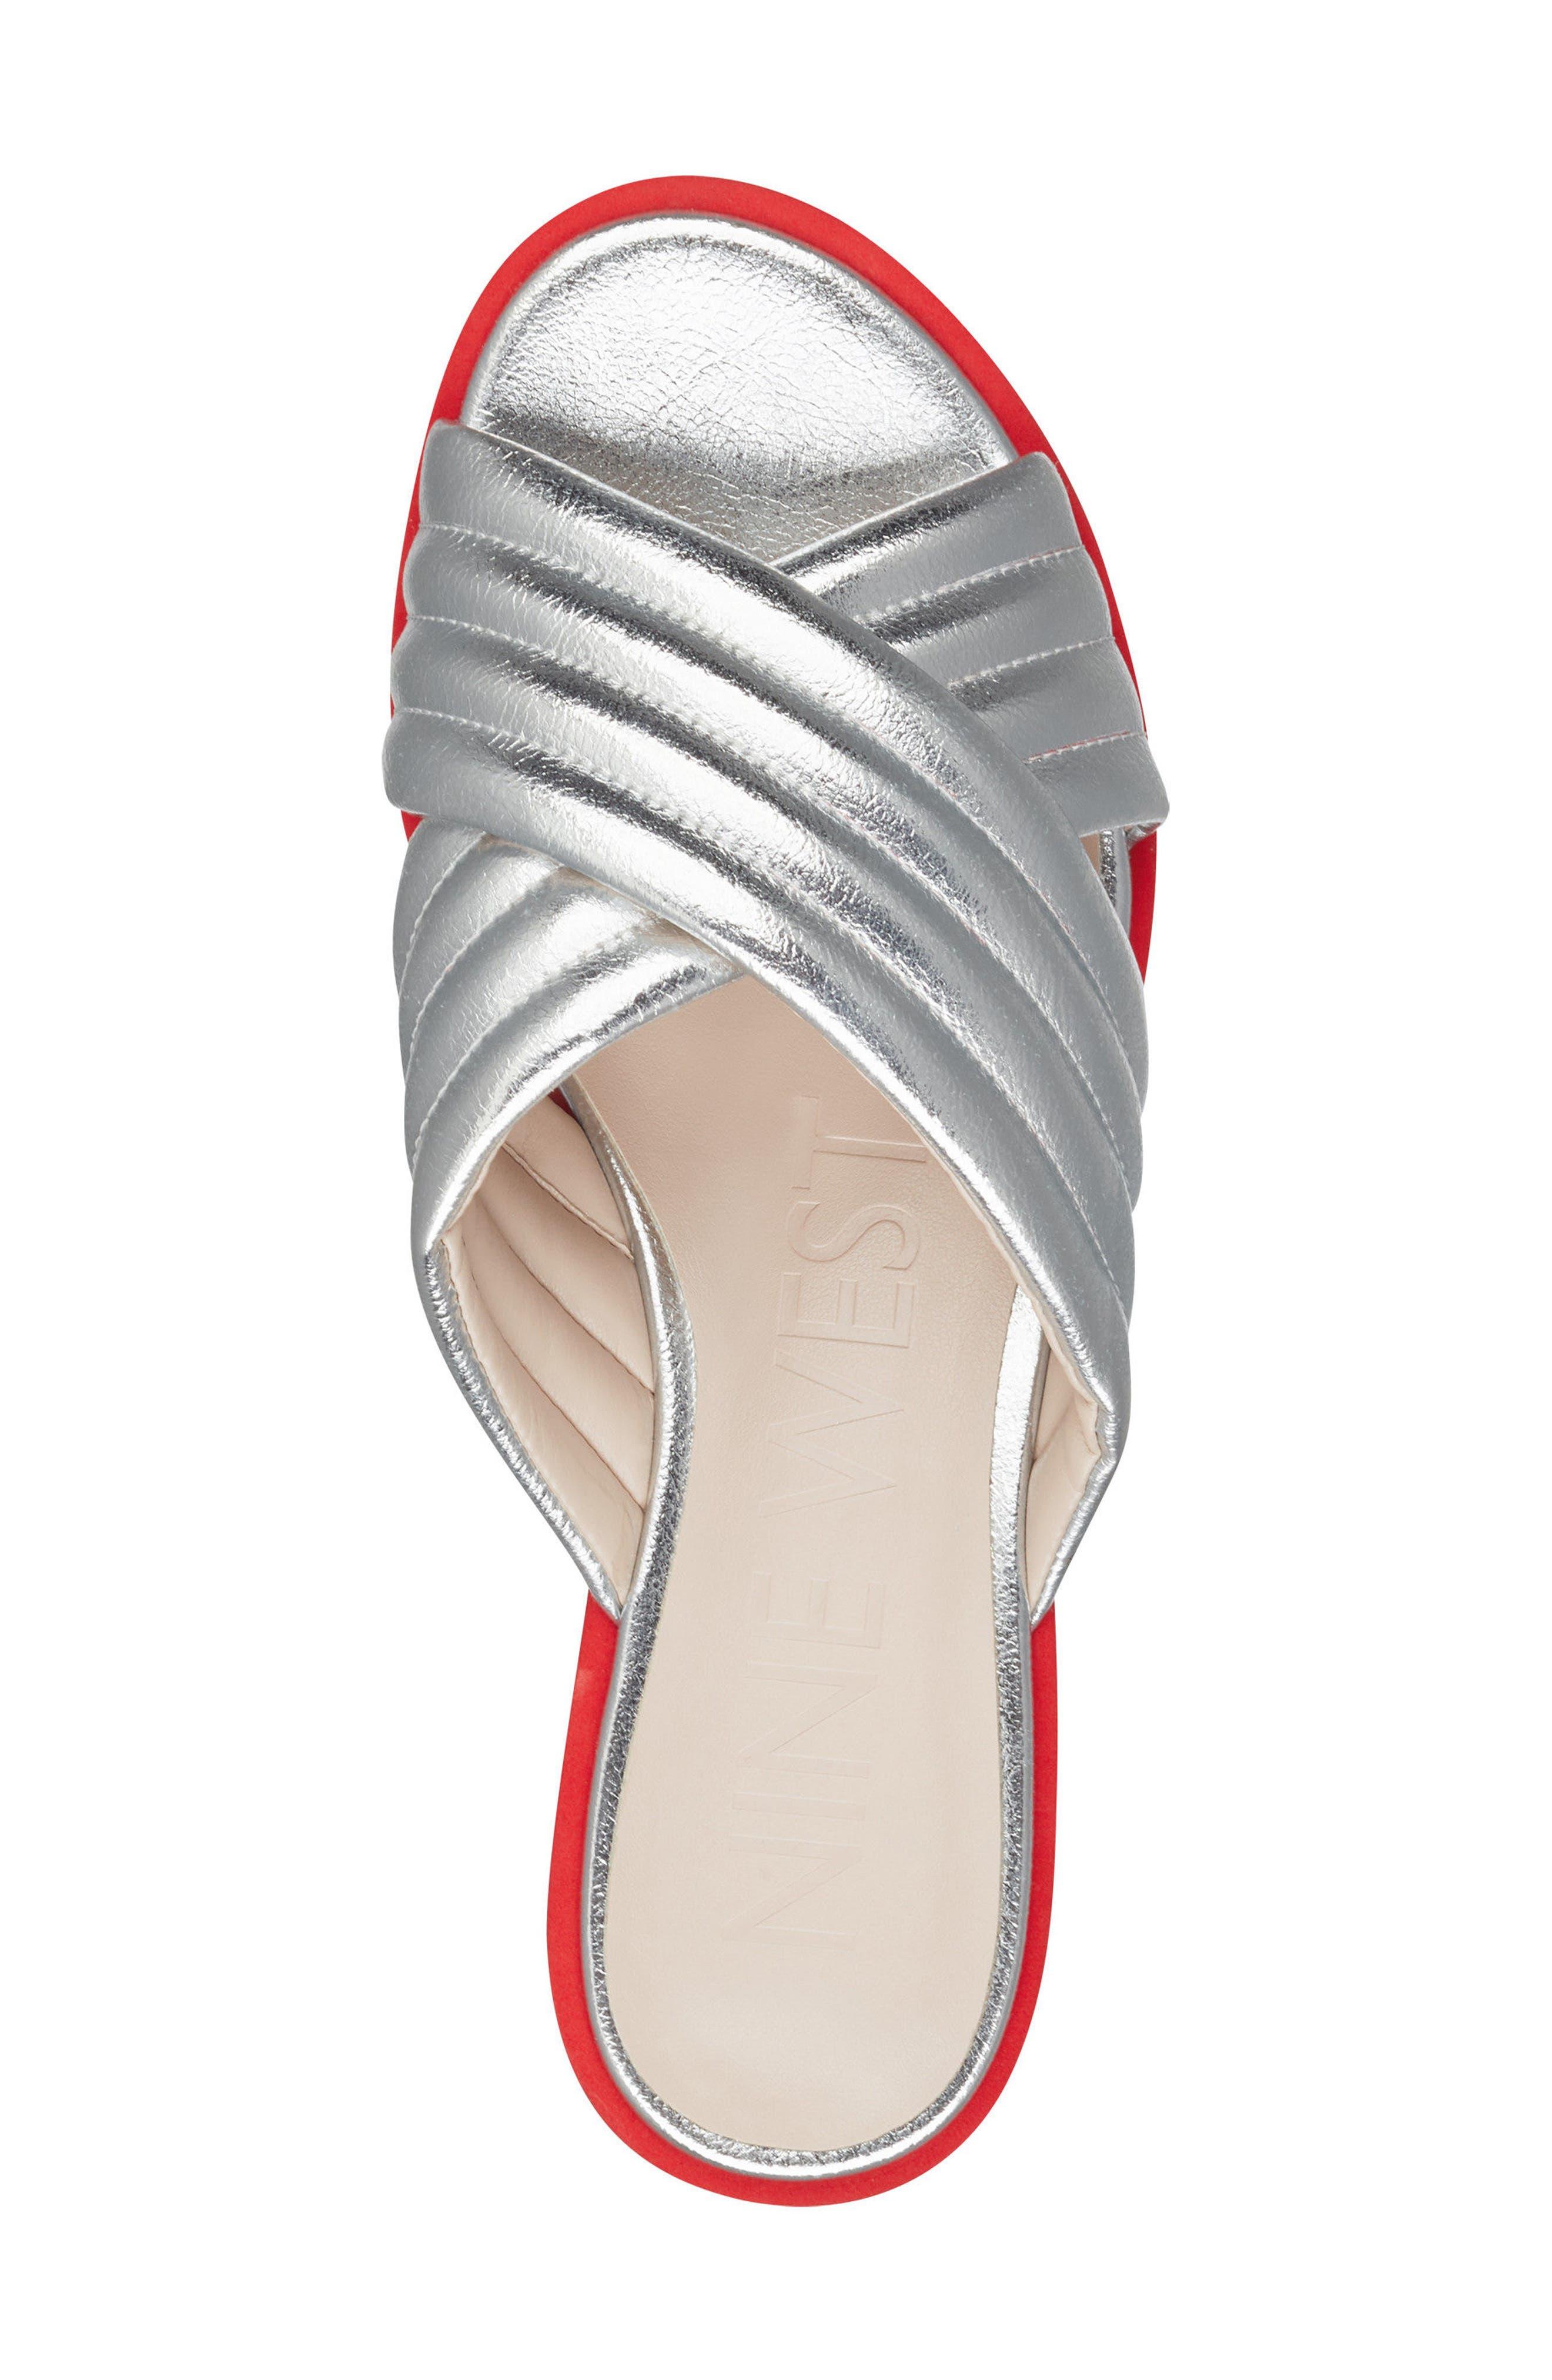 Zonita Platform Slide Sandal,                             Alternate thumbnail 5, color,                             Silver Faux Leather